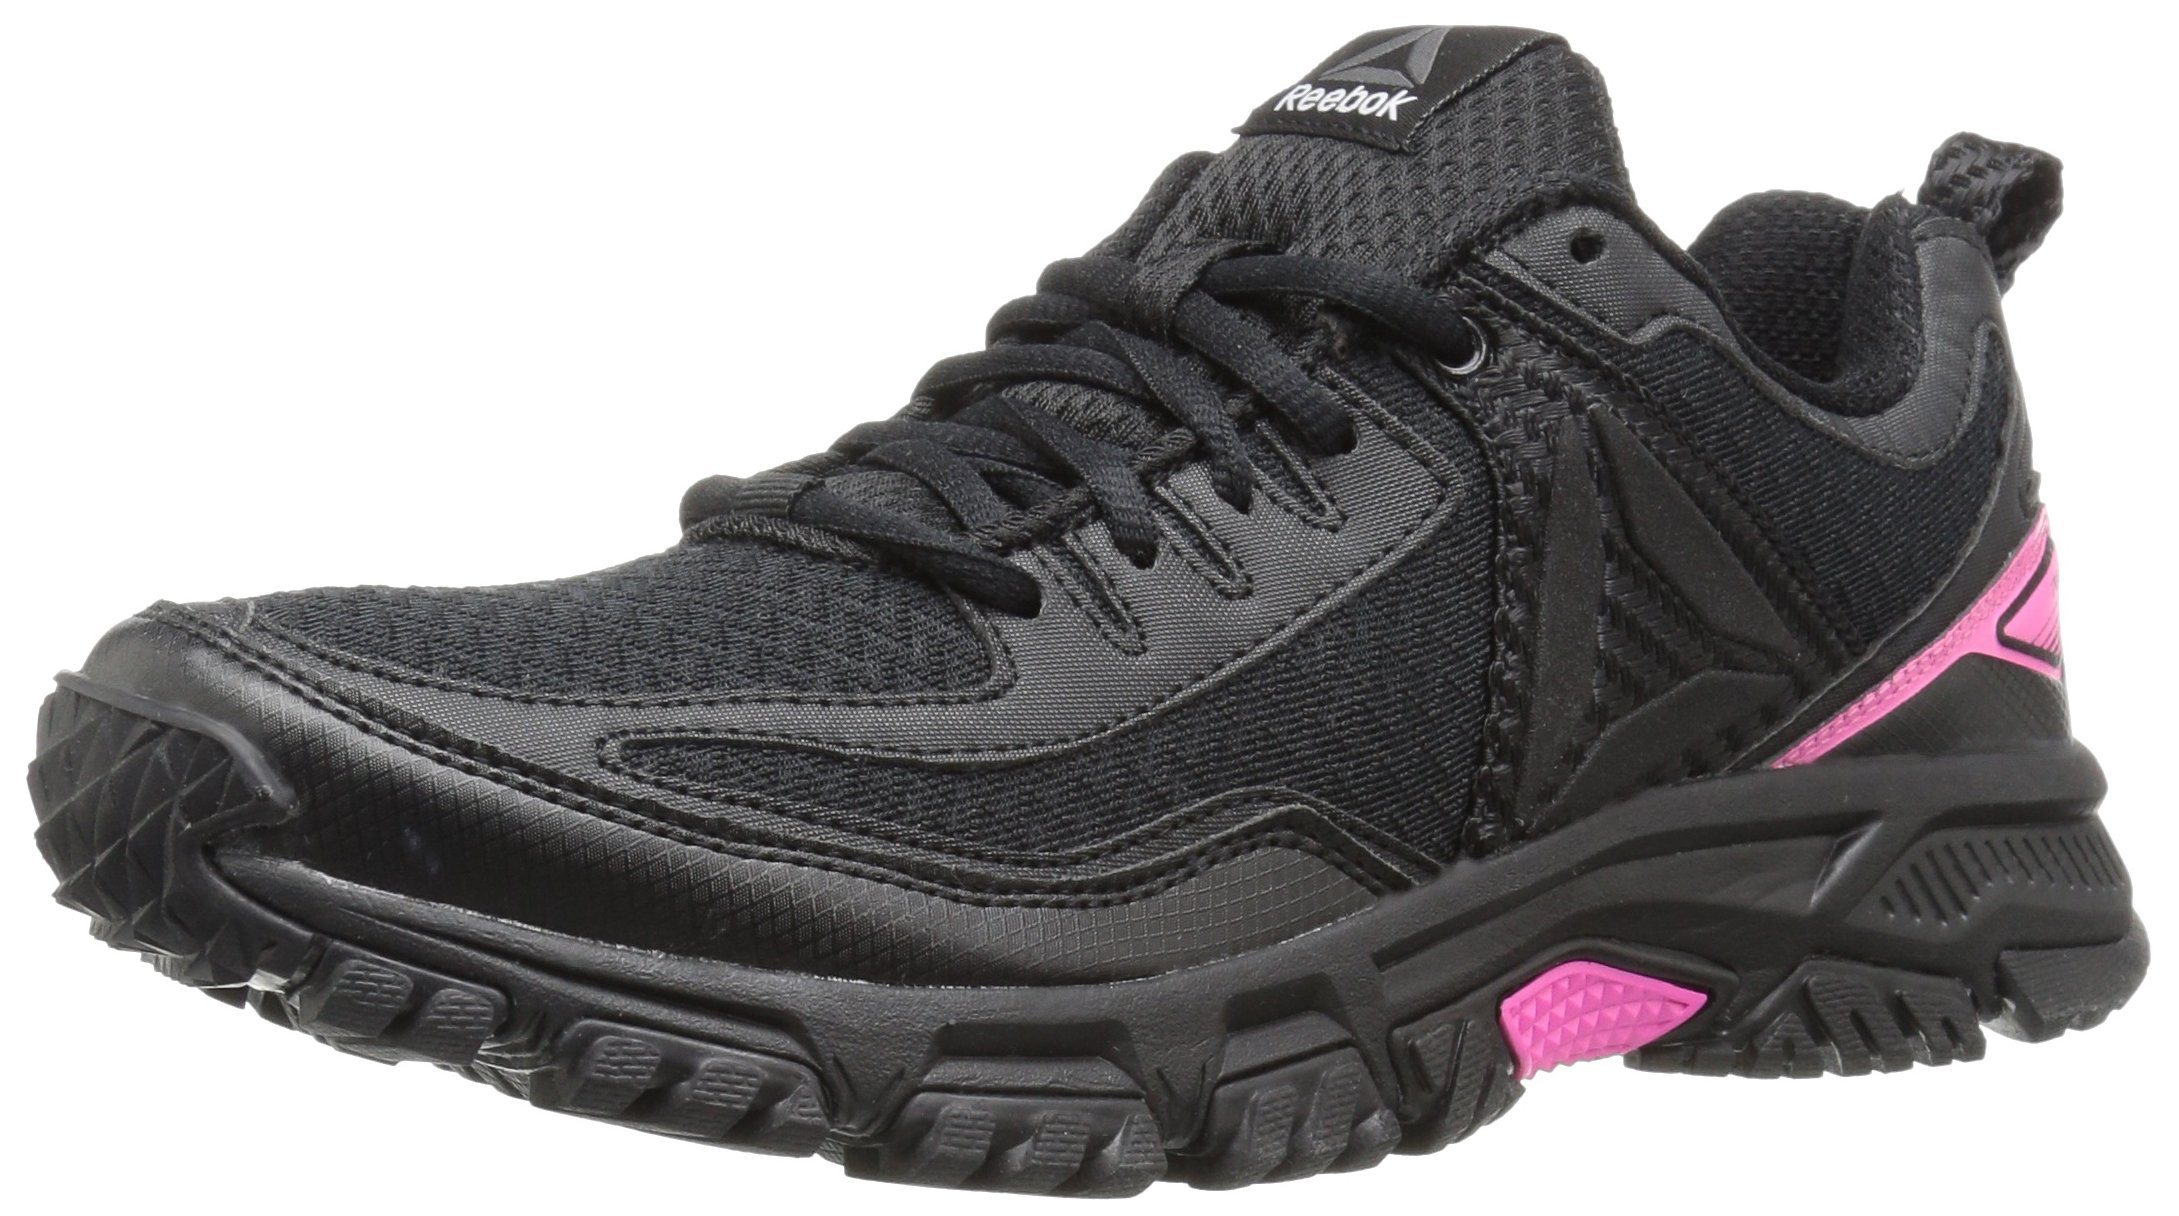 Reebok Women's Ridgerider Trail 2.0 Track Shoe, Black/Solar Pink/Silver/Pewter, 10.5 M US